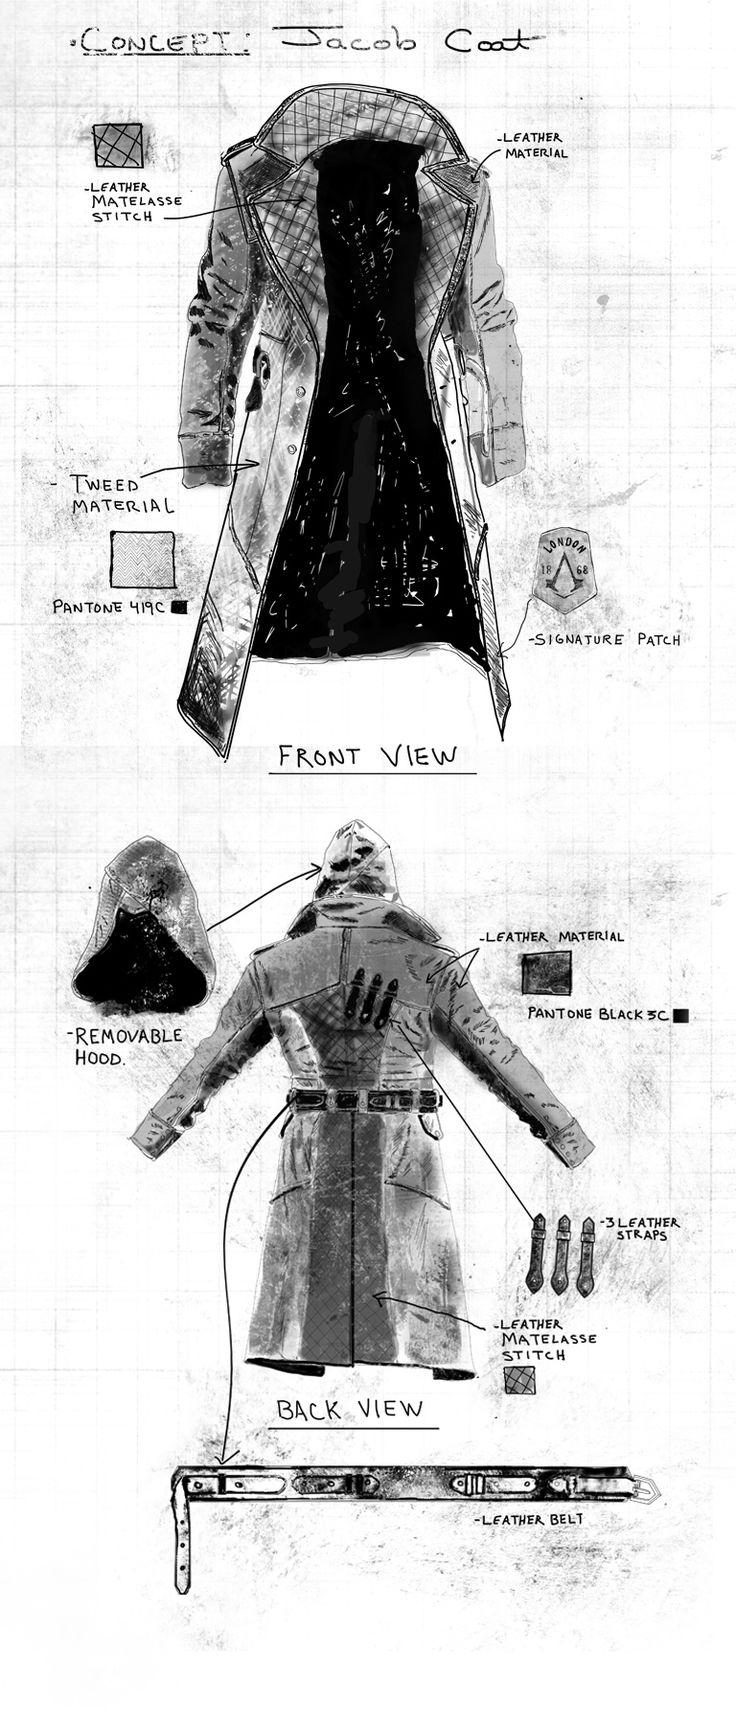 #AssassinsCreedSyndicate Jacob Coat -- ummmmmmm... YES!!